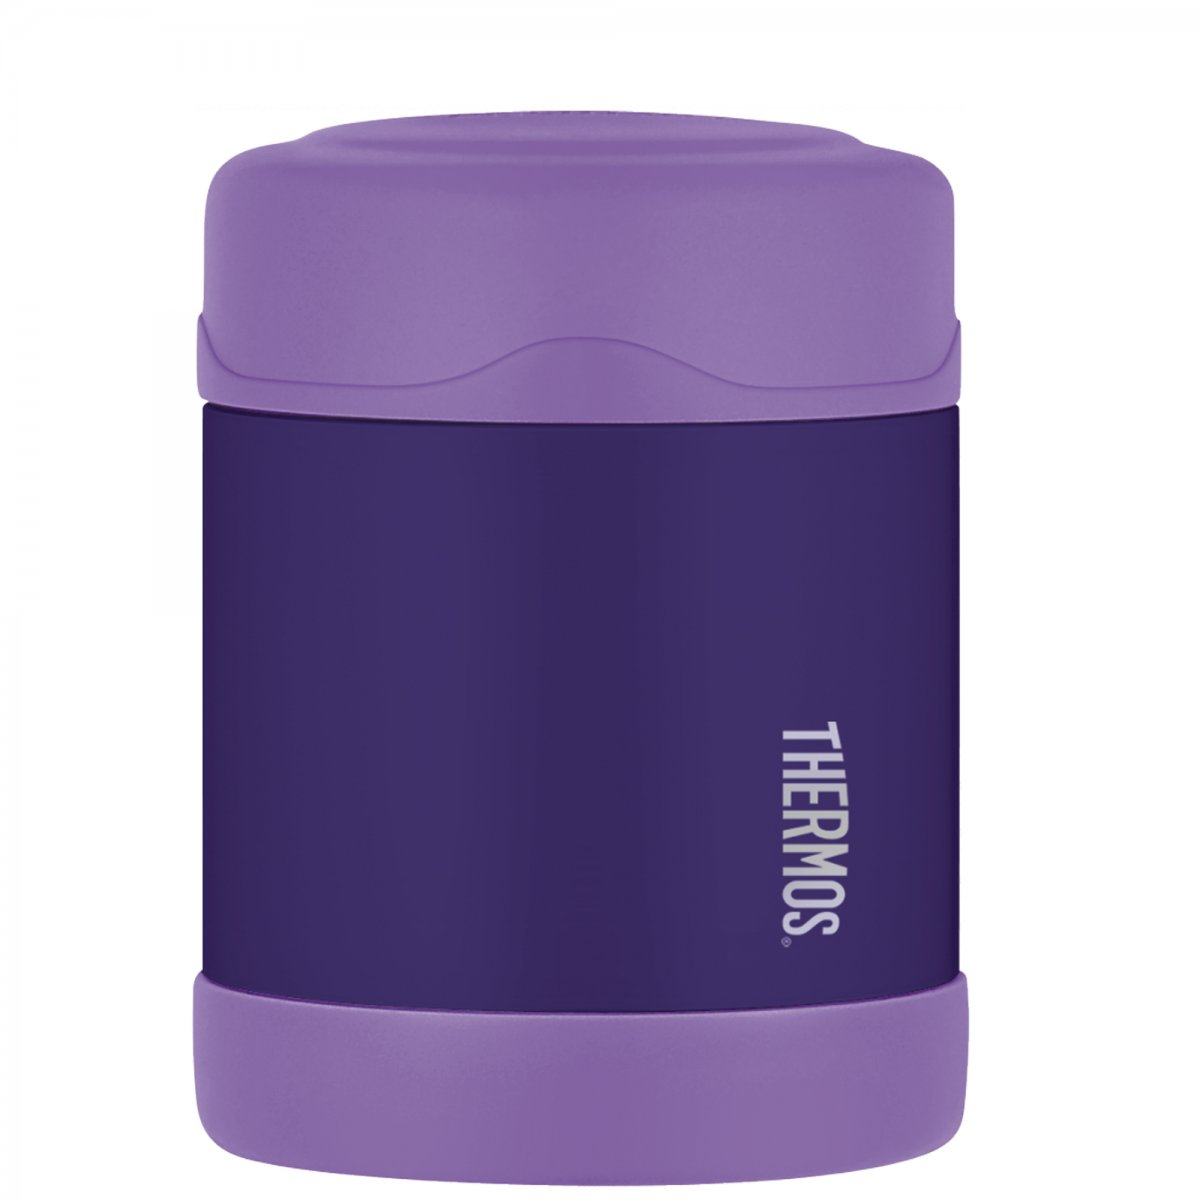 Pote Inox Térmica Thermos Funtainer | Cor: Roxo/ Lilás